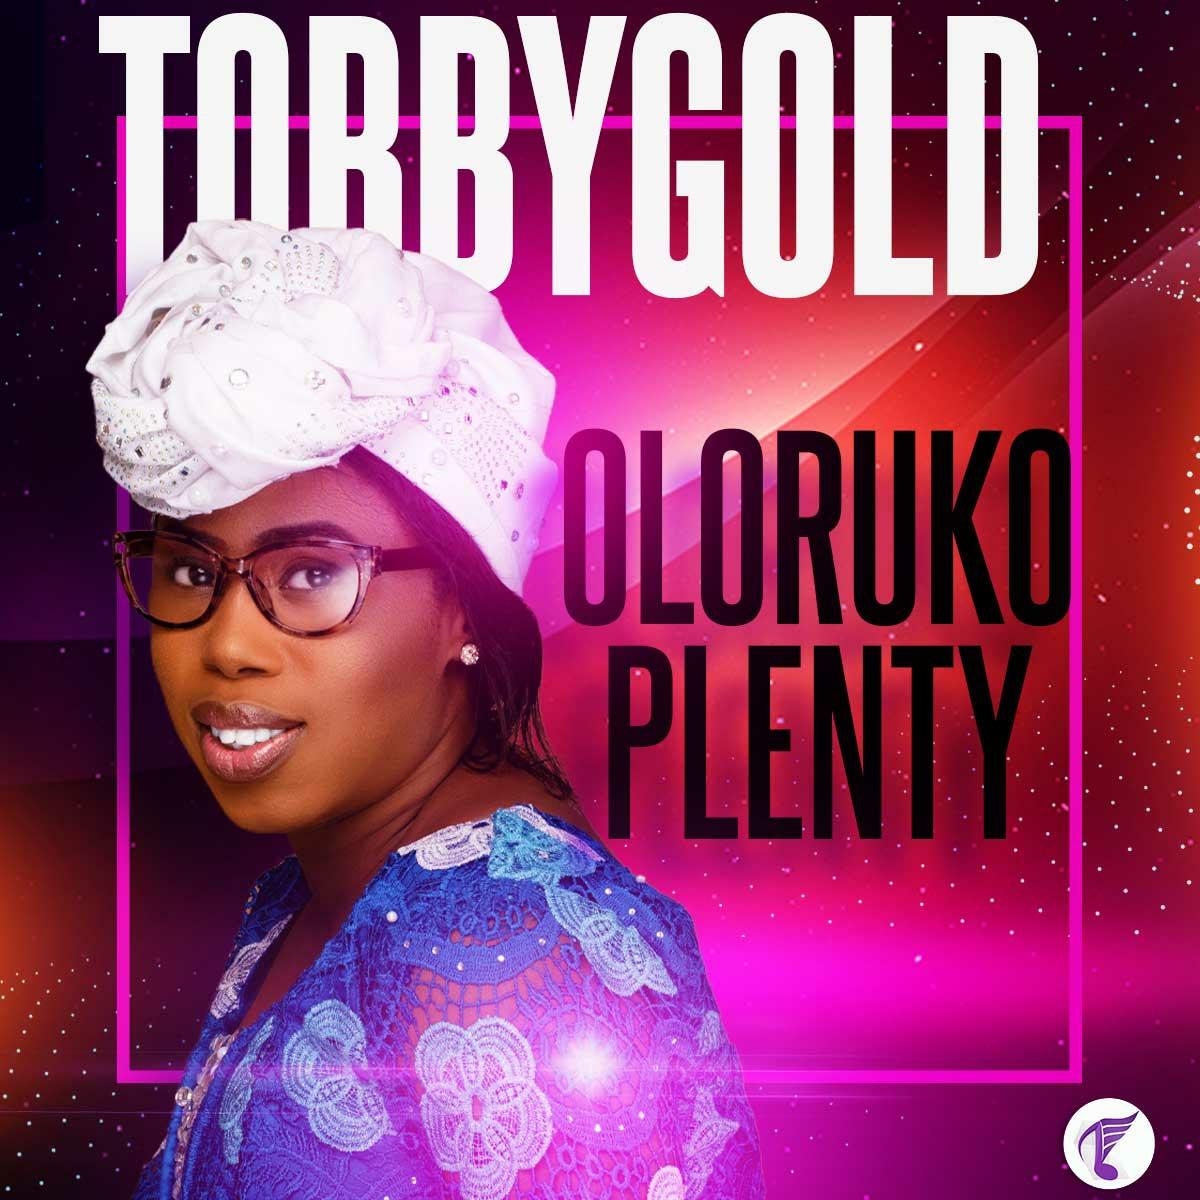 tobbygold